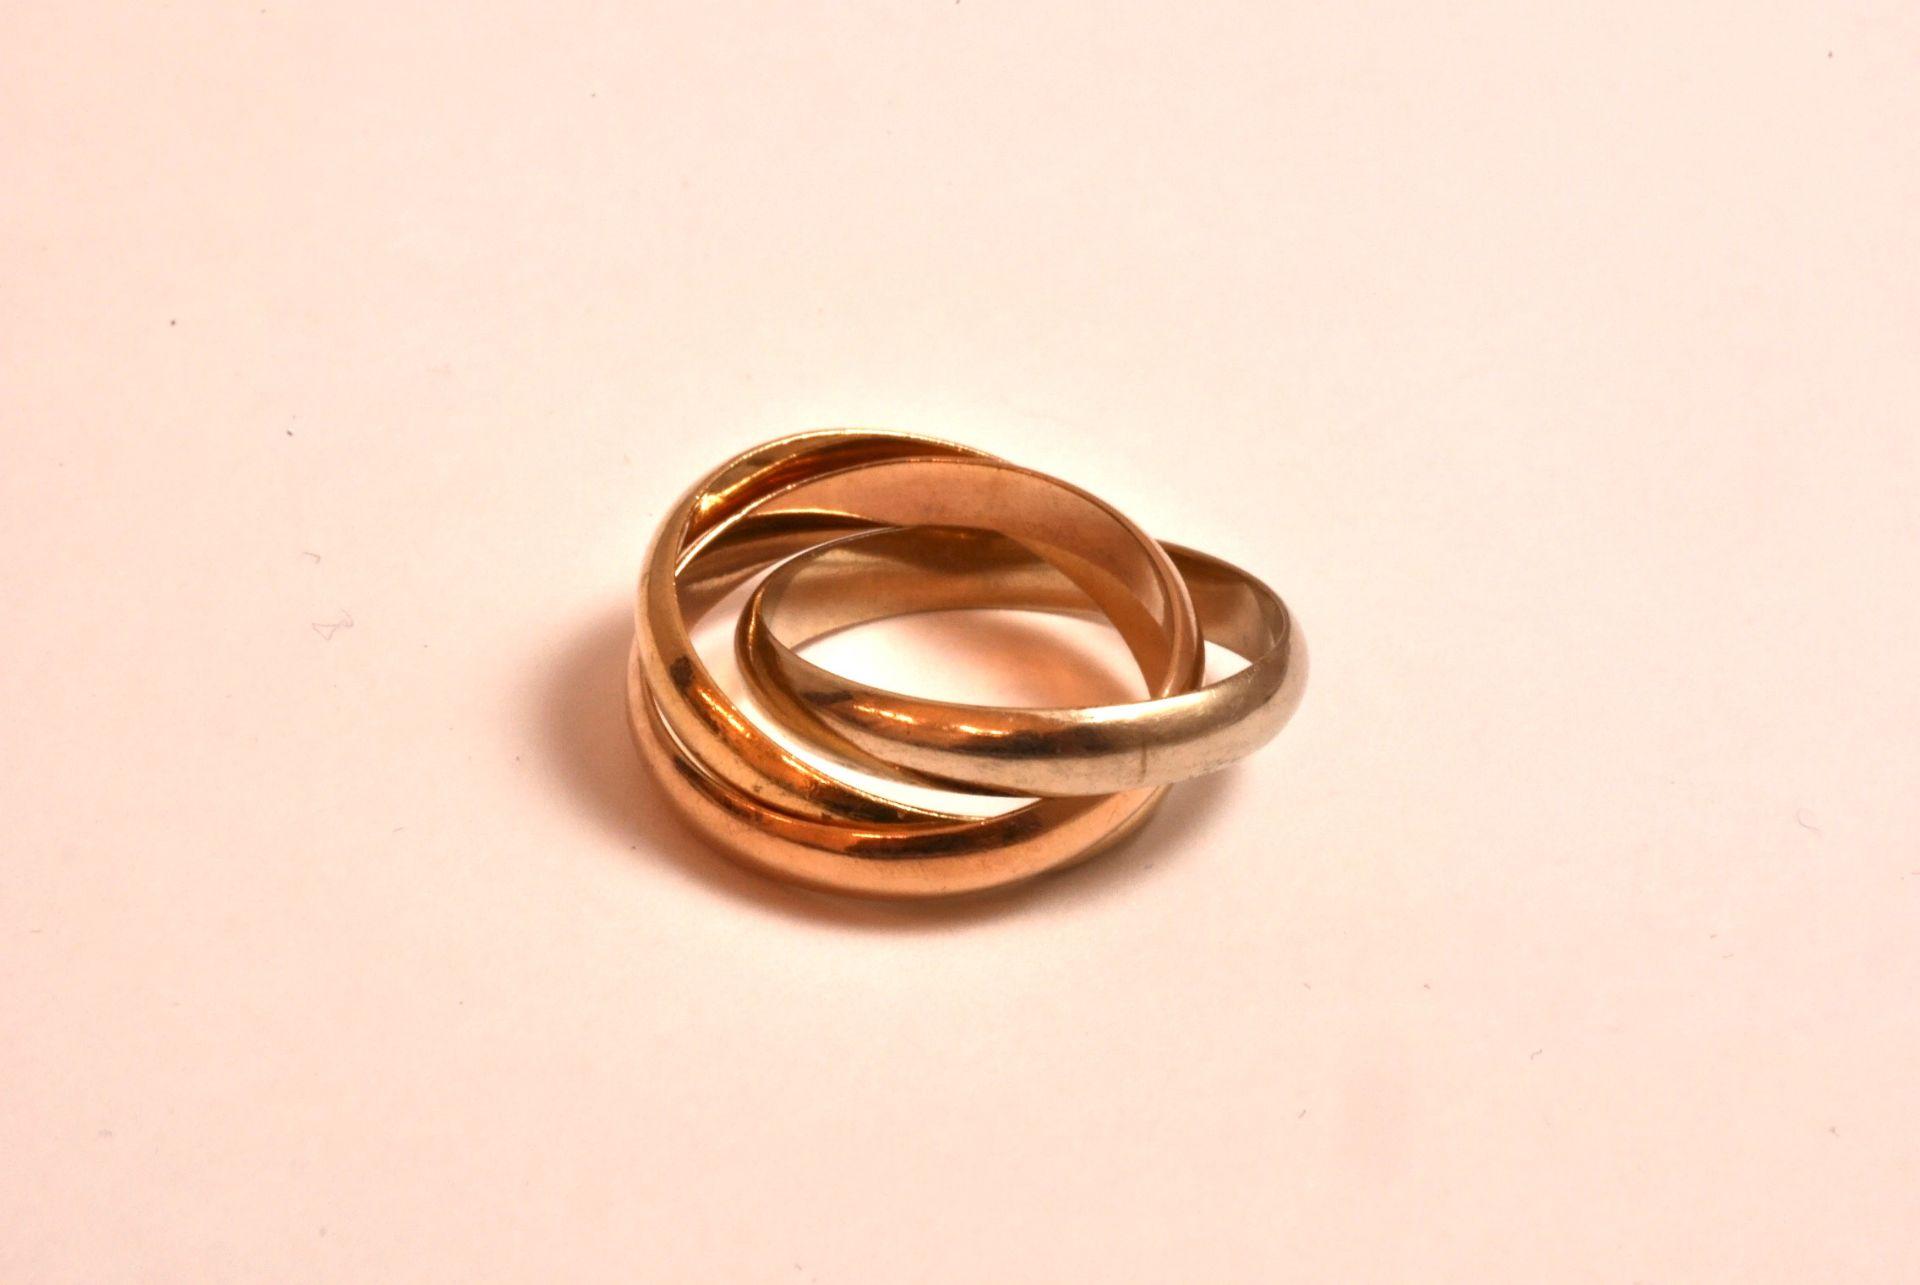 Trinity-Ring WG/RG/GG 750, 8,5 Gramm